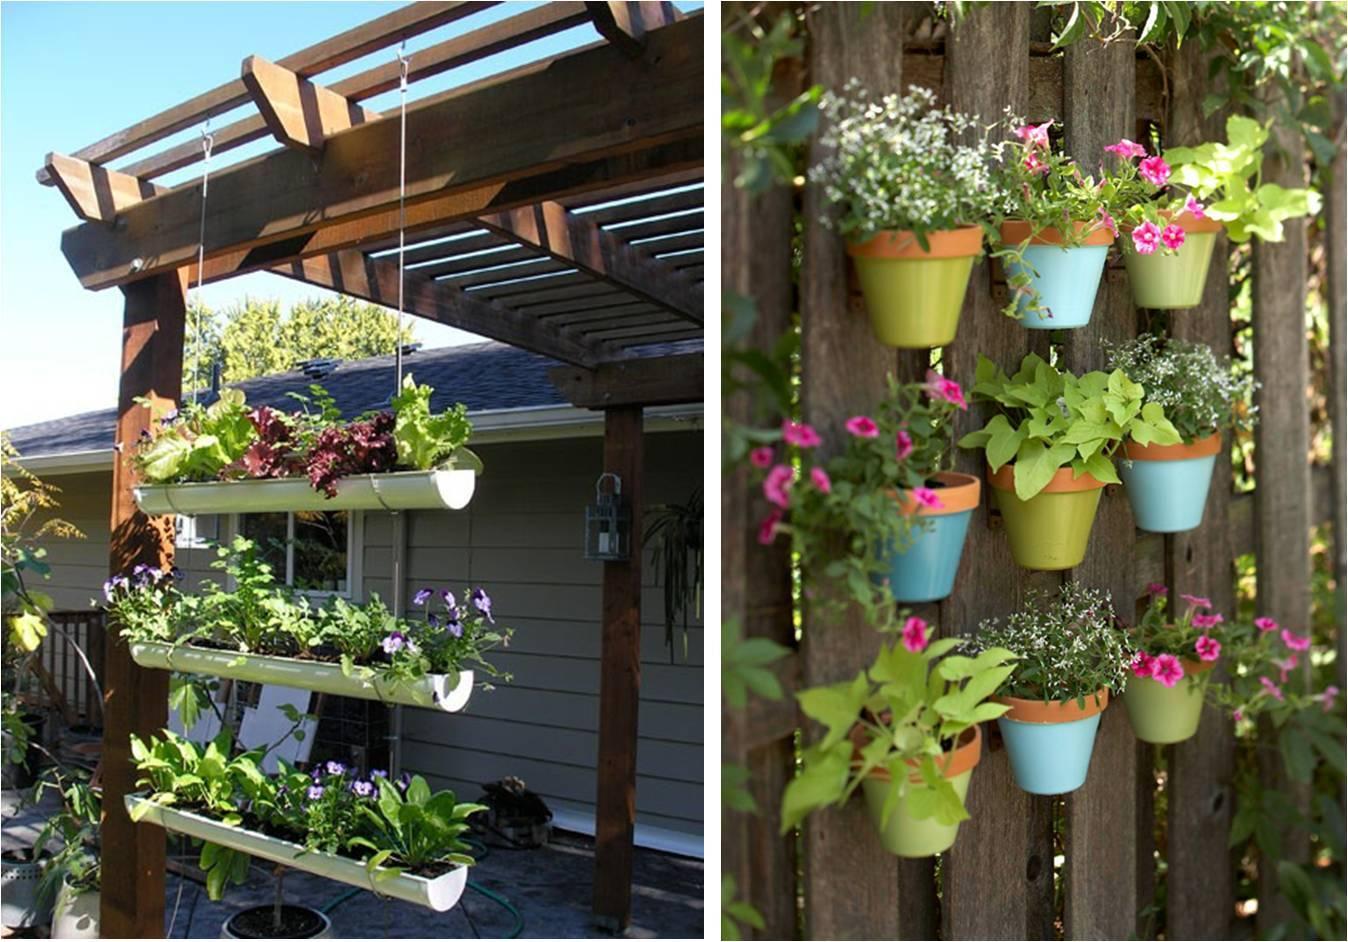 jardim ideias simples : jardim ideias simples:Quintal Jardim Vertical